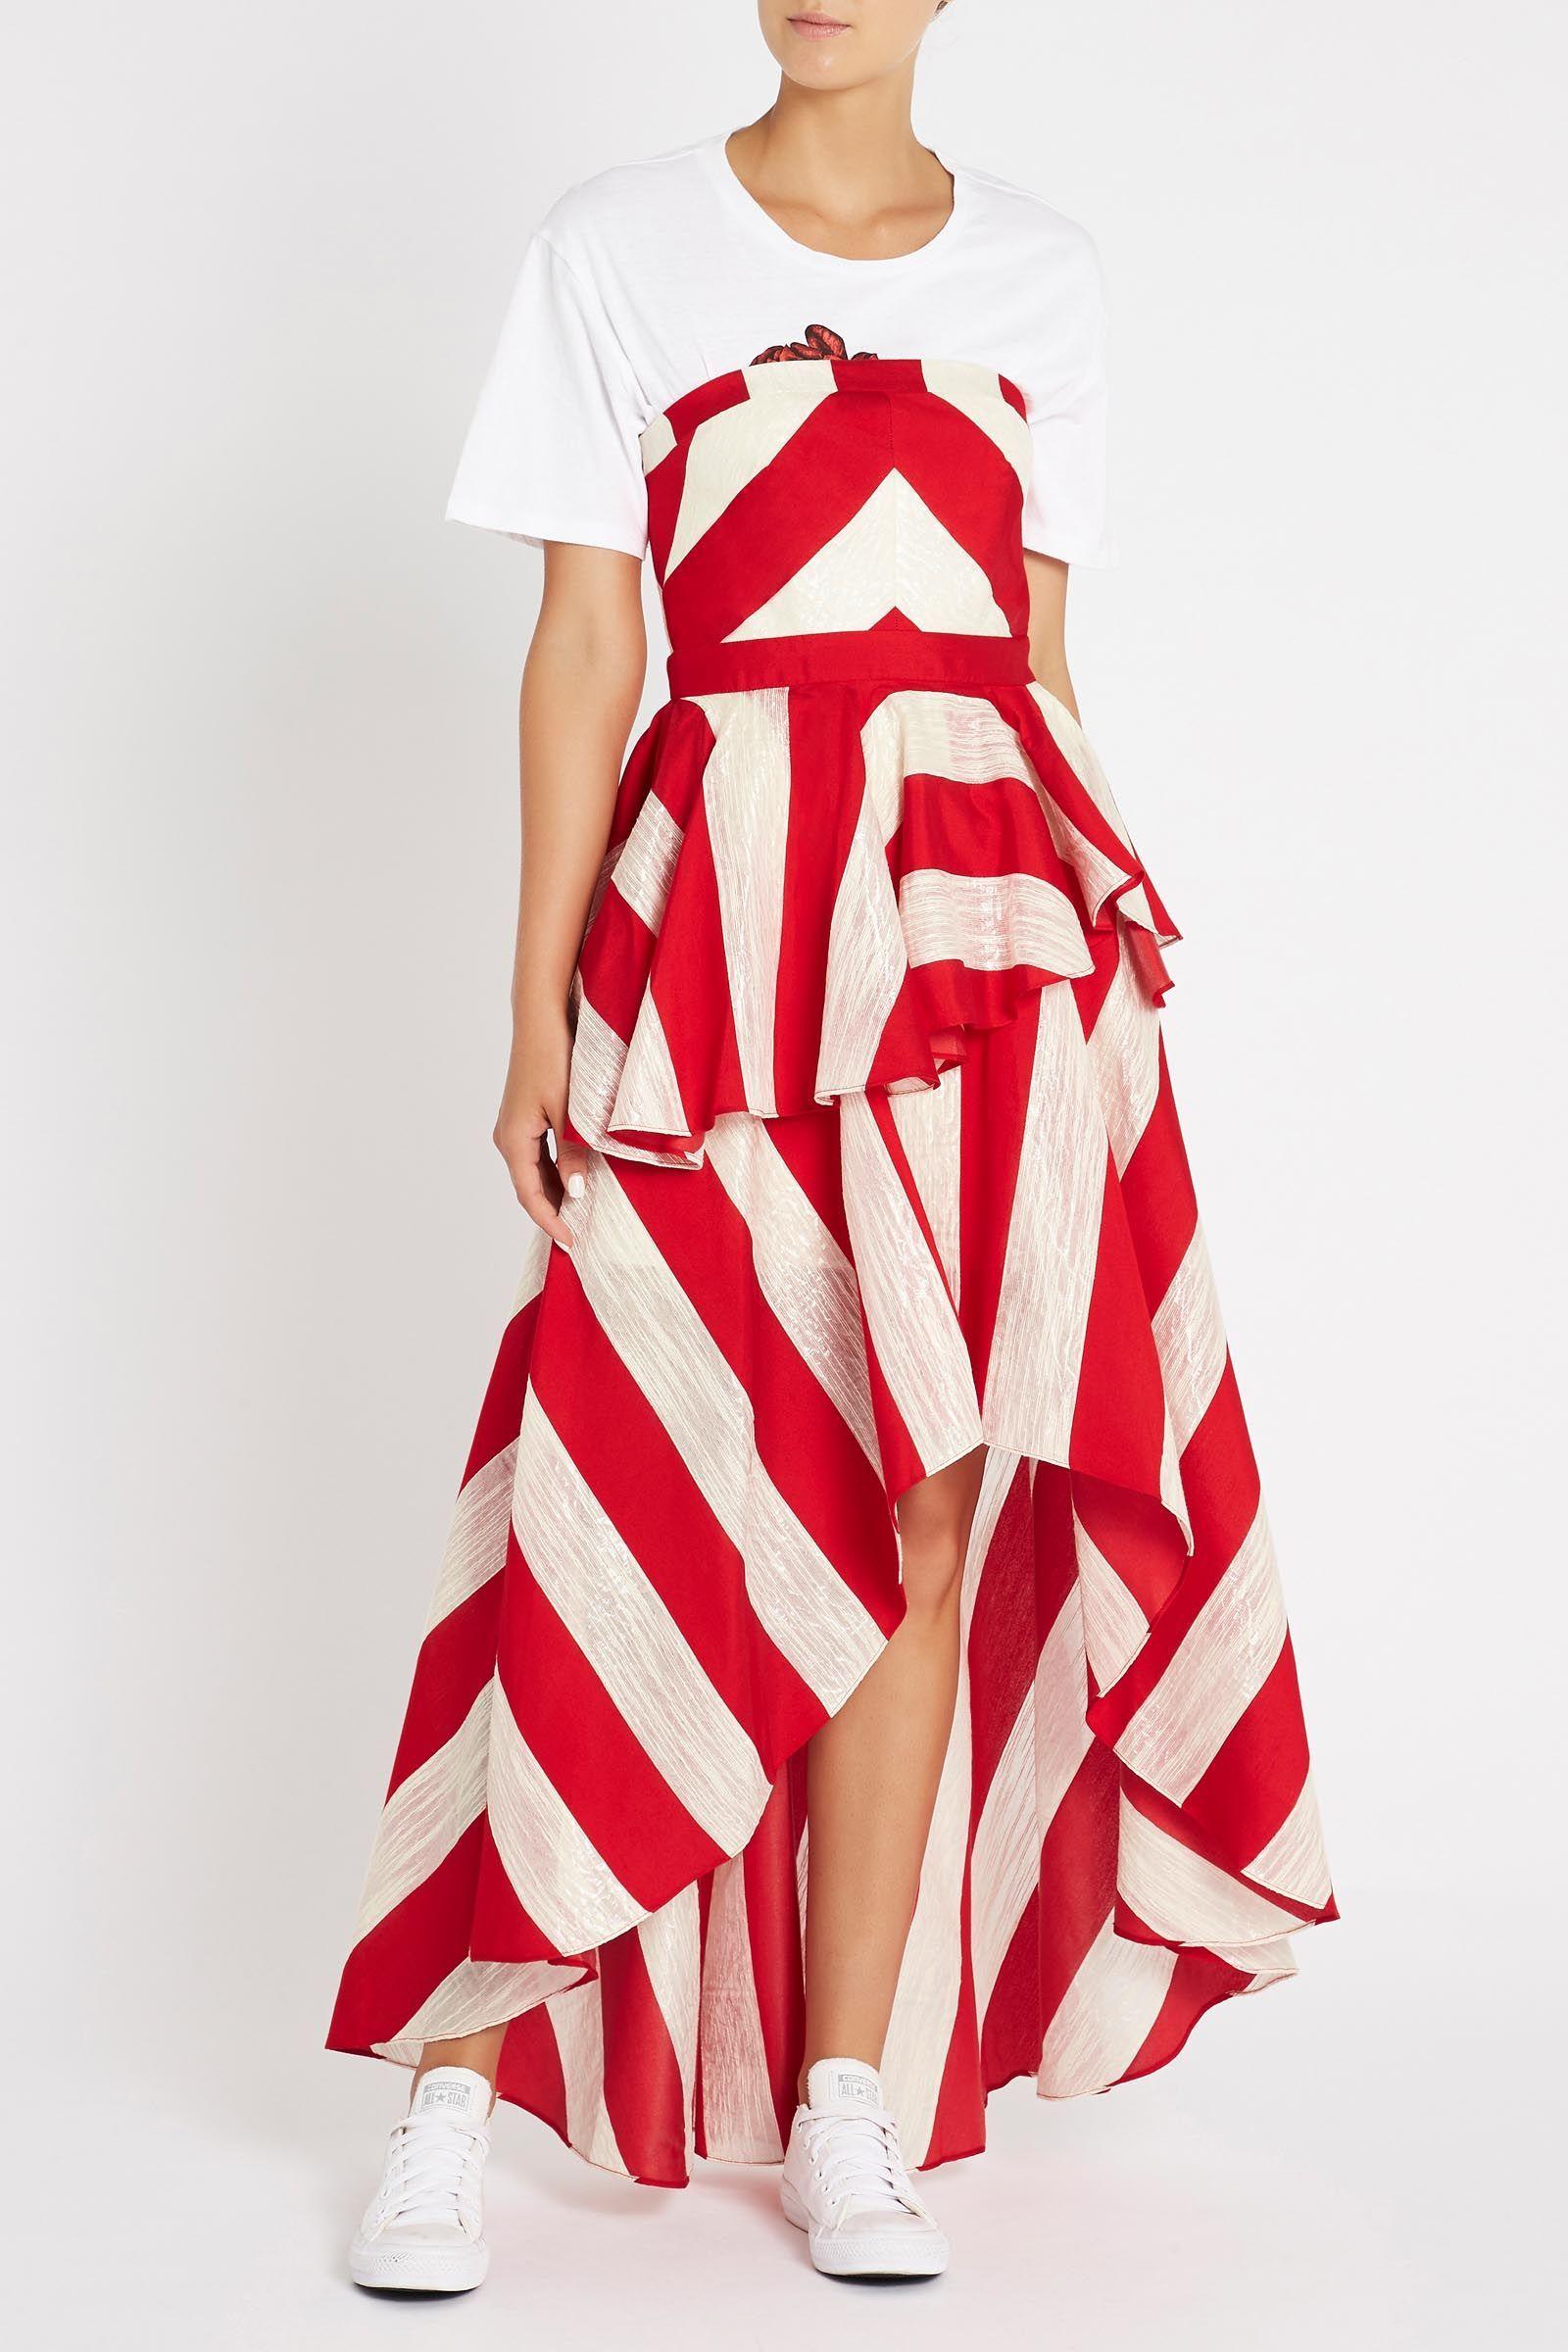 c9bf3e572e4 Childrens Formal Dresses Australia Afterpay - Gomes Weine AG